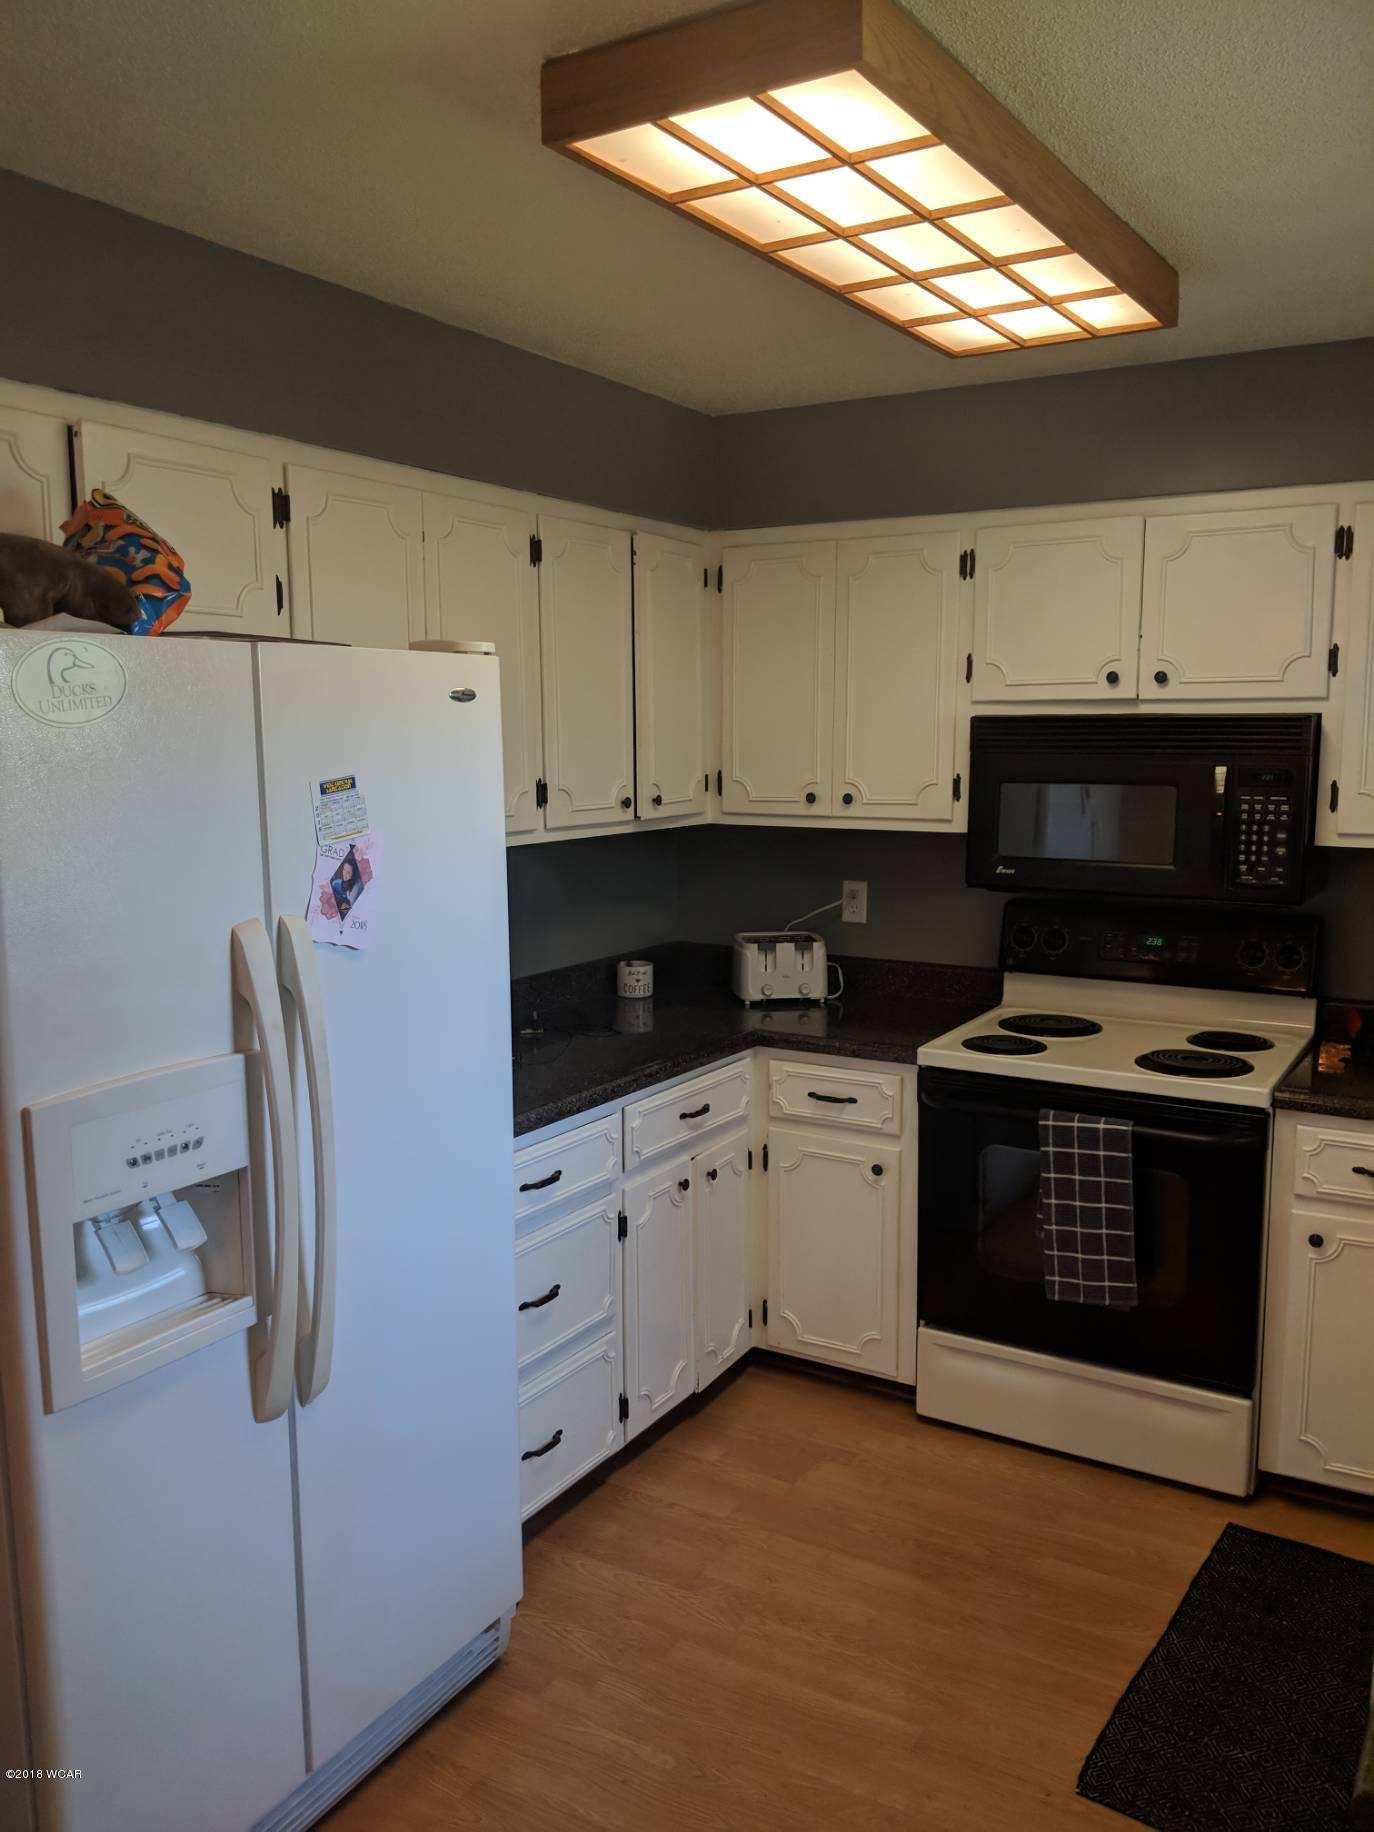 511 1st Avenue,Raymond,4 Bedrooms Bedrooms,2 BathroomsBathrooms,Single Family,1st Avenue,6032418